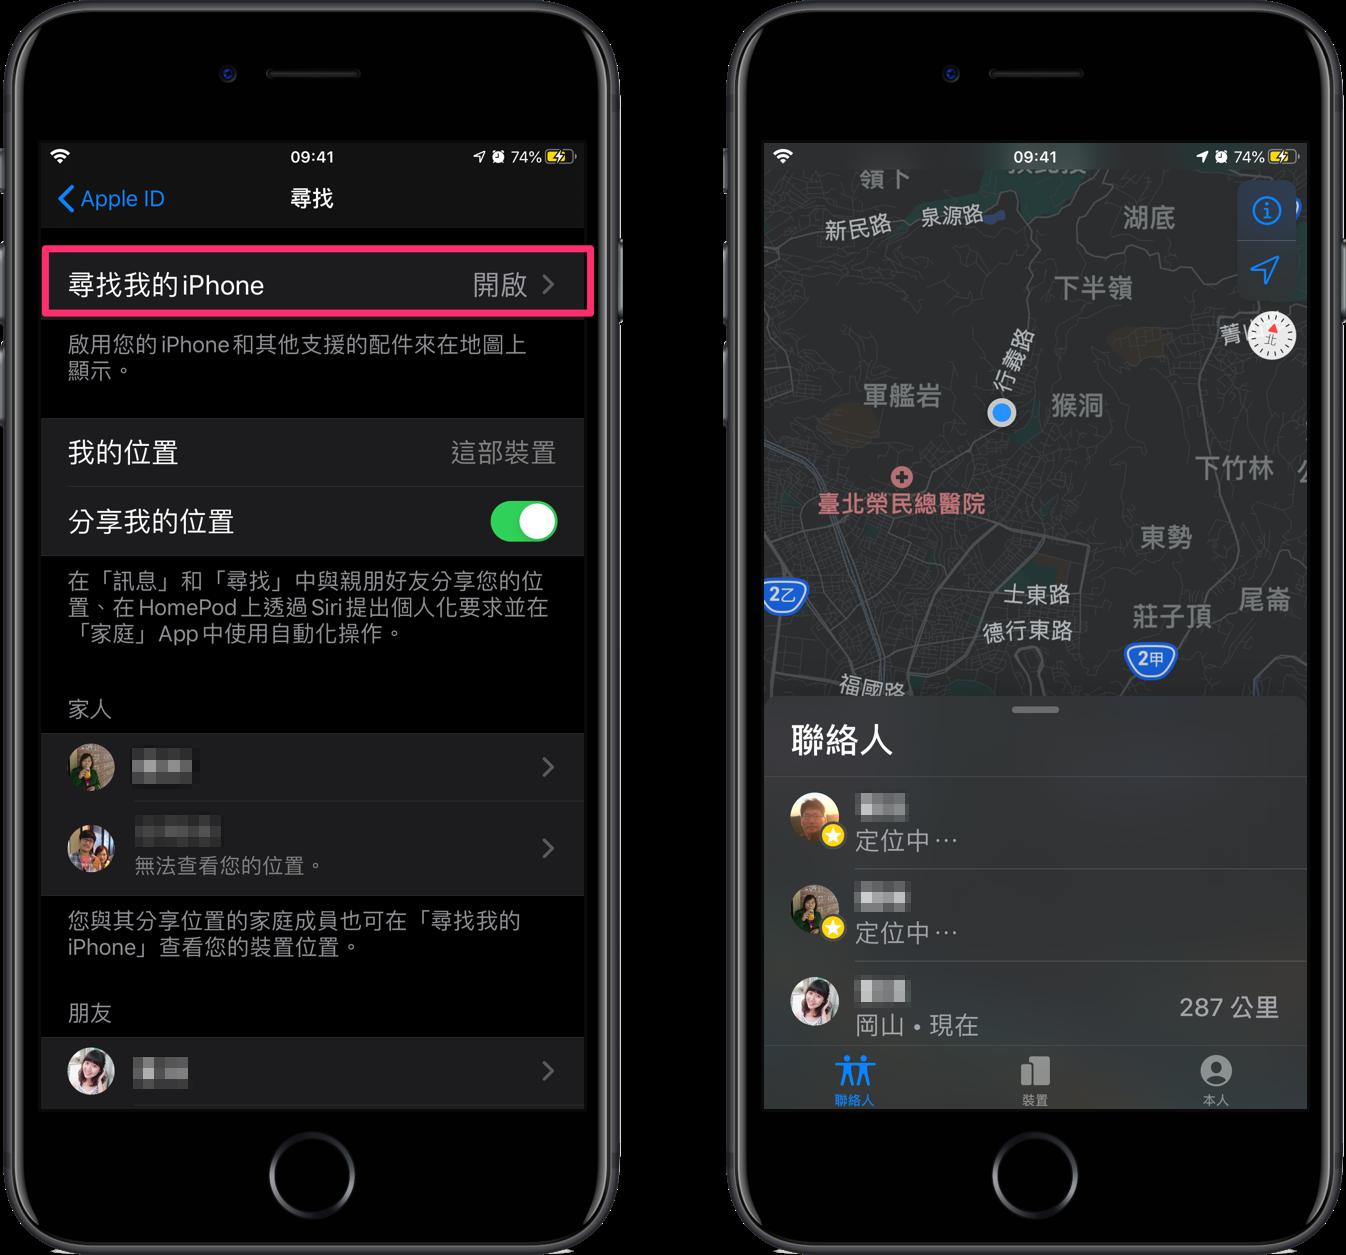 iPhone 山區遇難